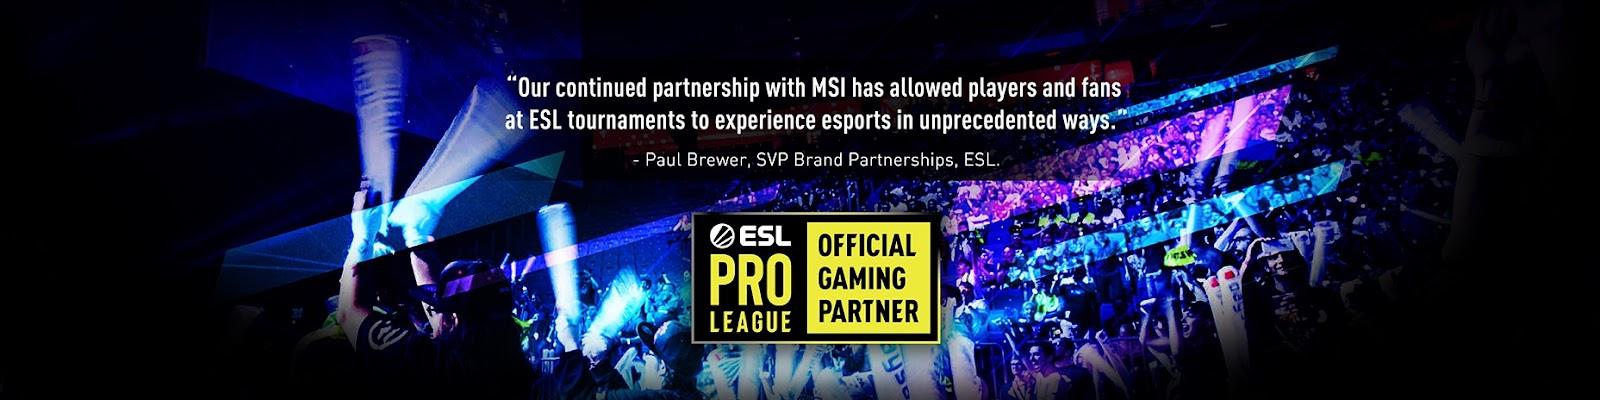 official gaming partner